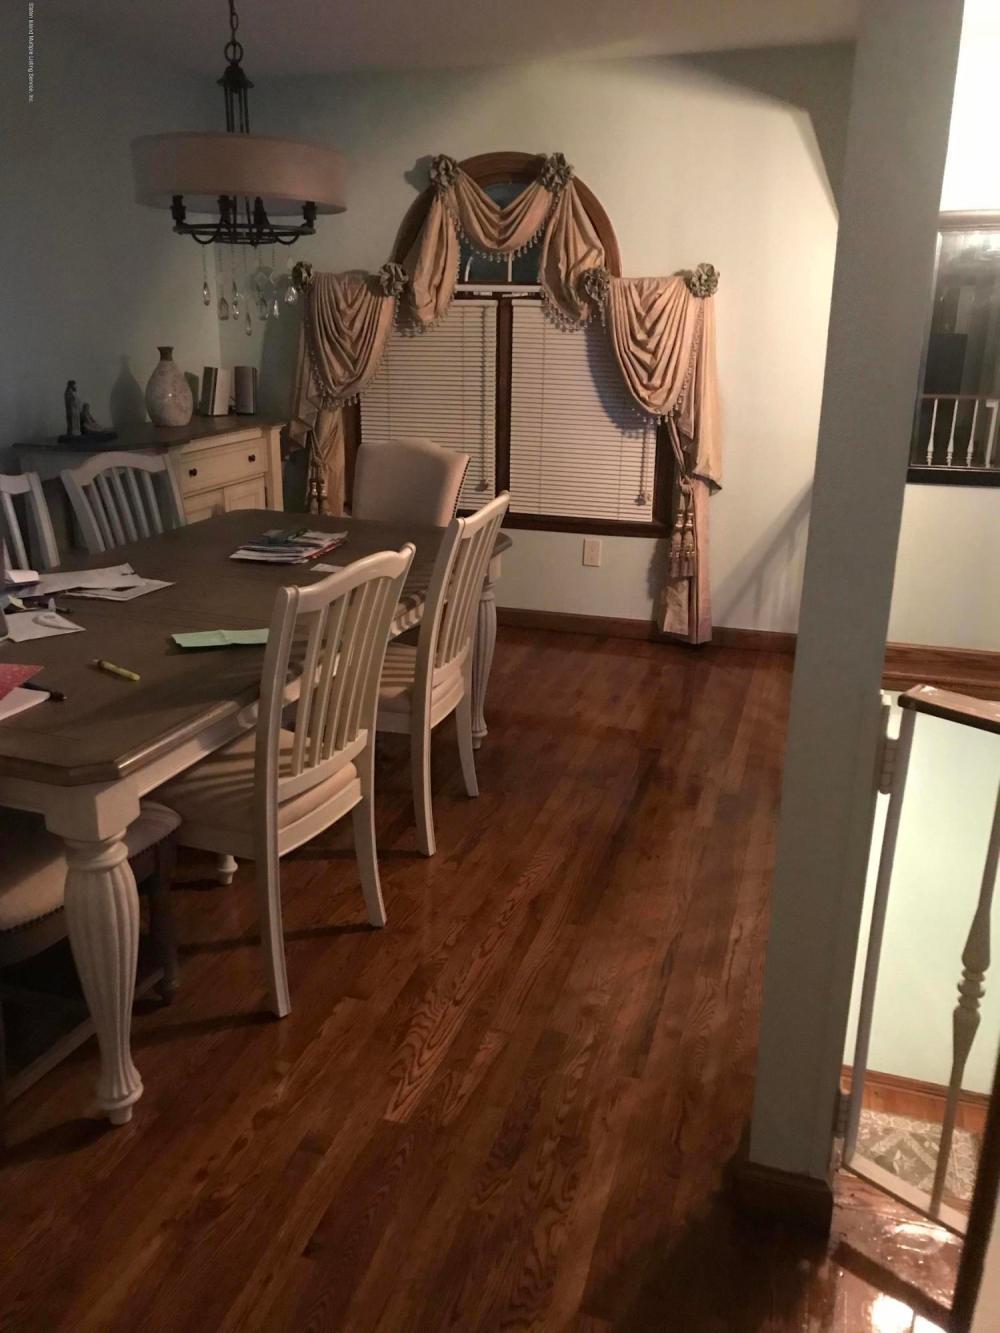 675 Collfield Avenue,Staten Island,New York,10314,United States,3 Bedrooms Bedrooms,8 Rooms Rooms,3 BathroomsBathrooms,Res-Rental,Collfield,1124457